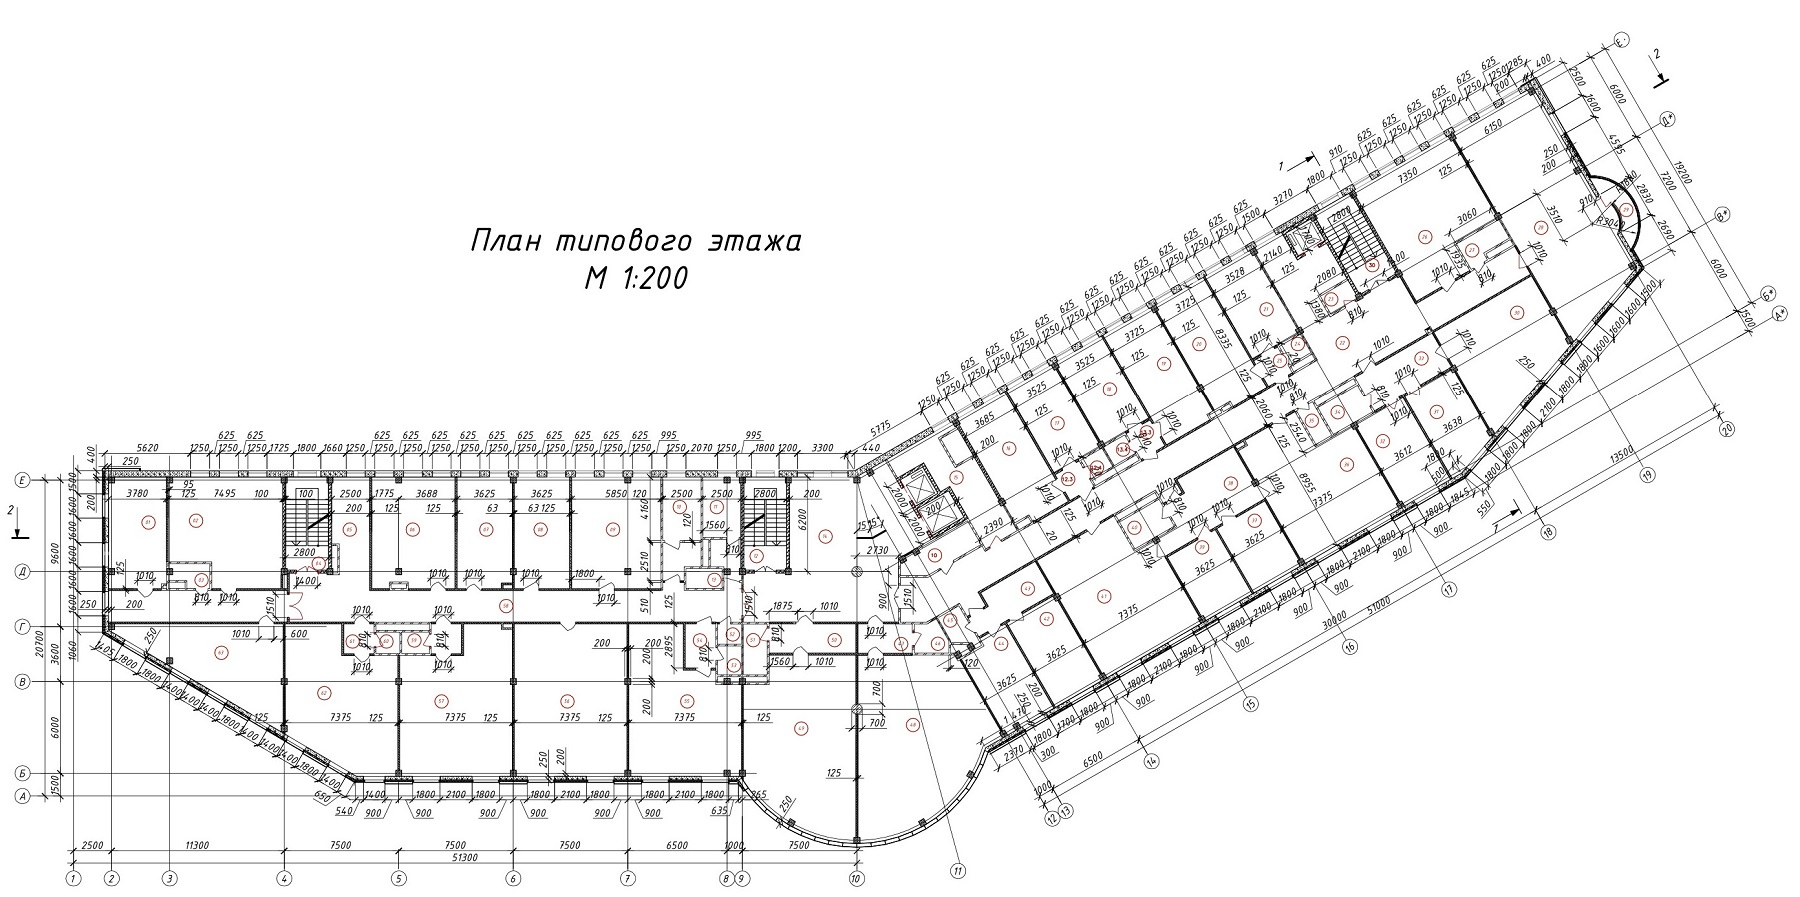 Заливка ленточного фундамента под забор цена работы в Химках